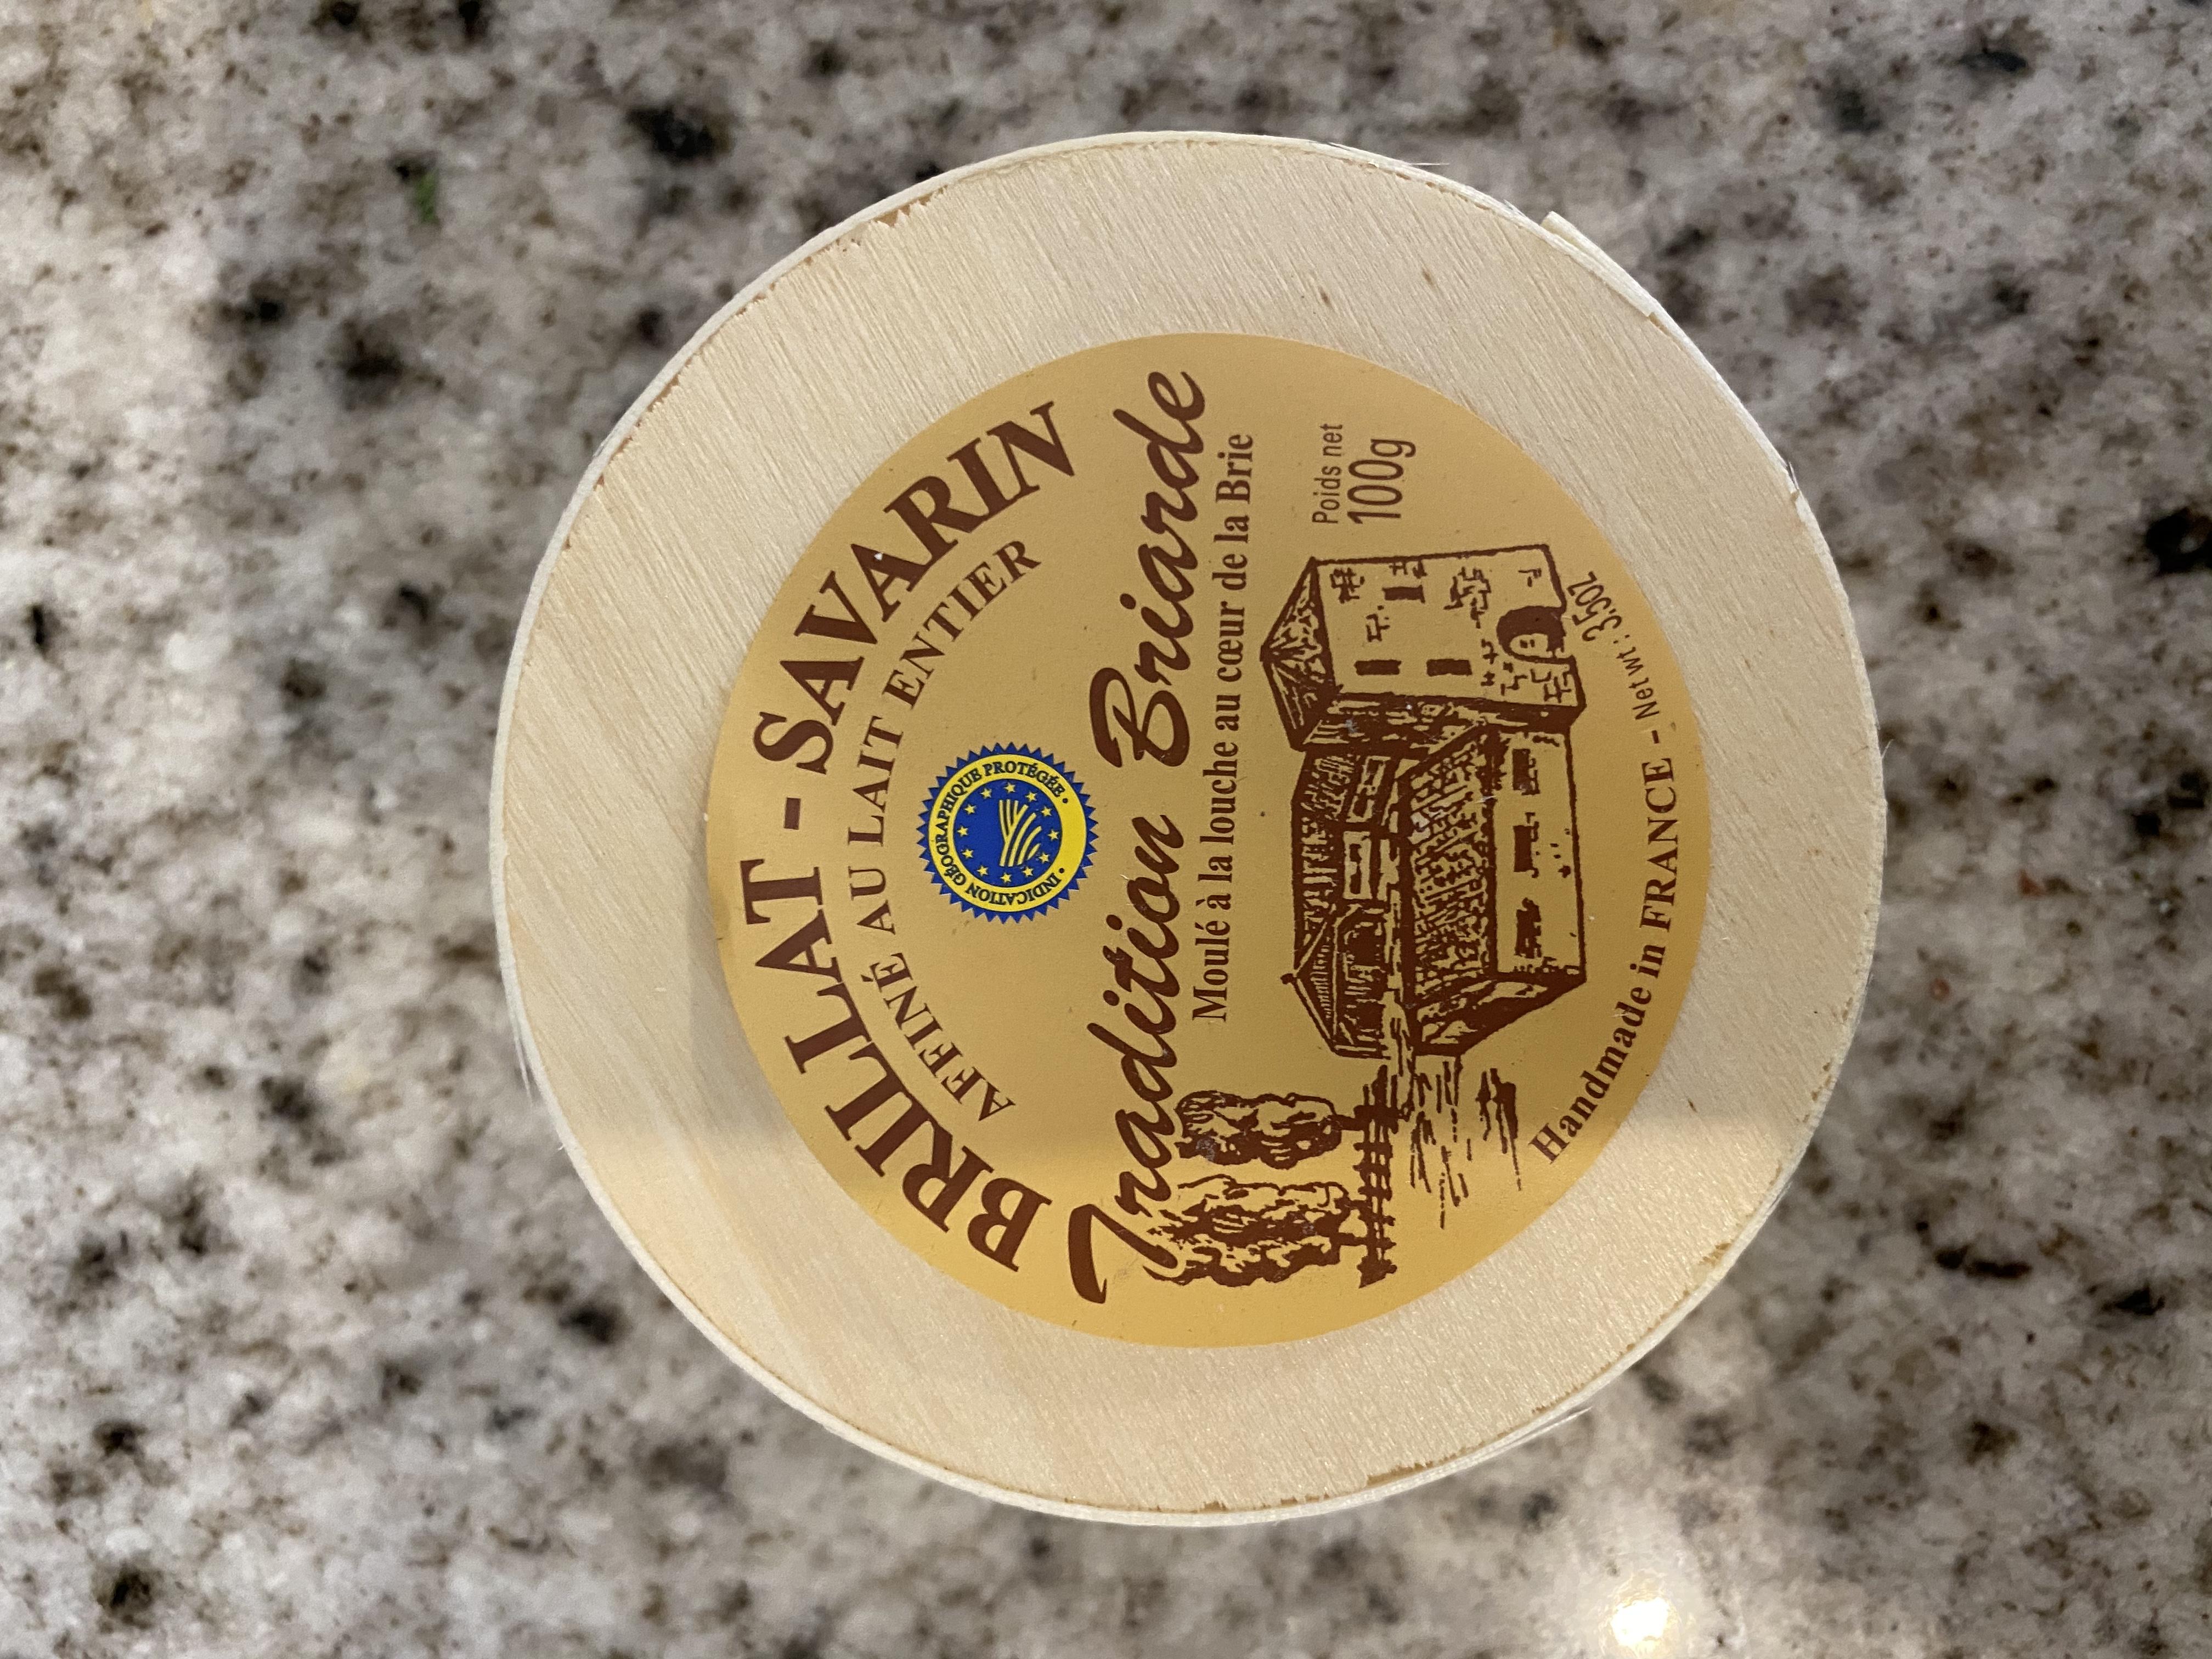 Brillat-Savarin Tradition Briarde